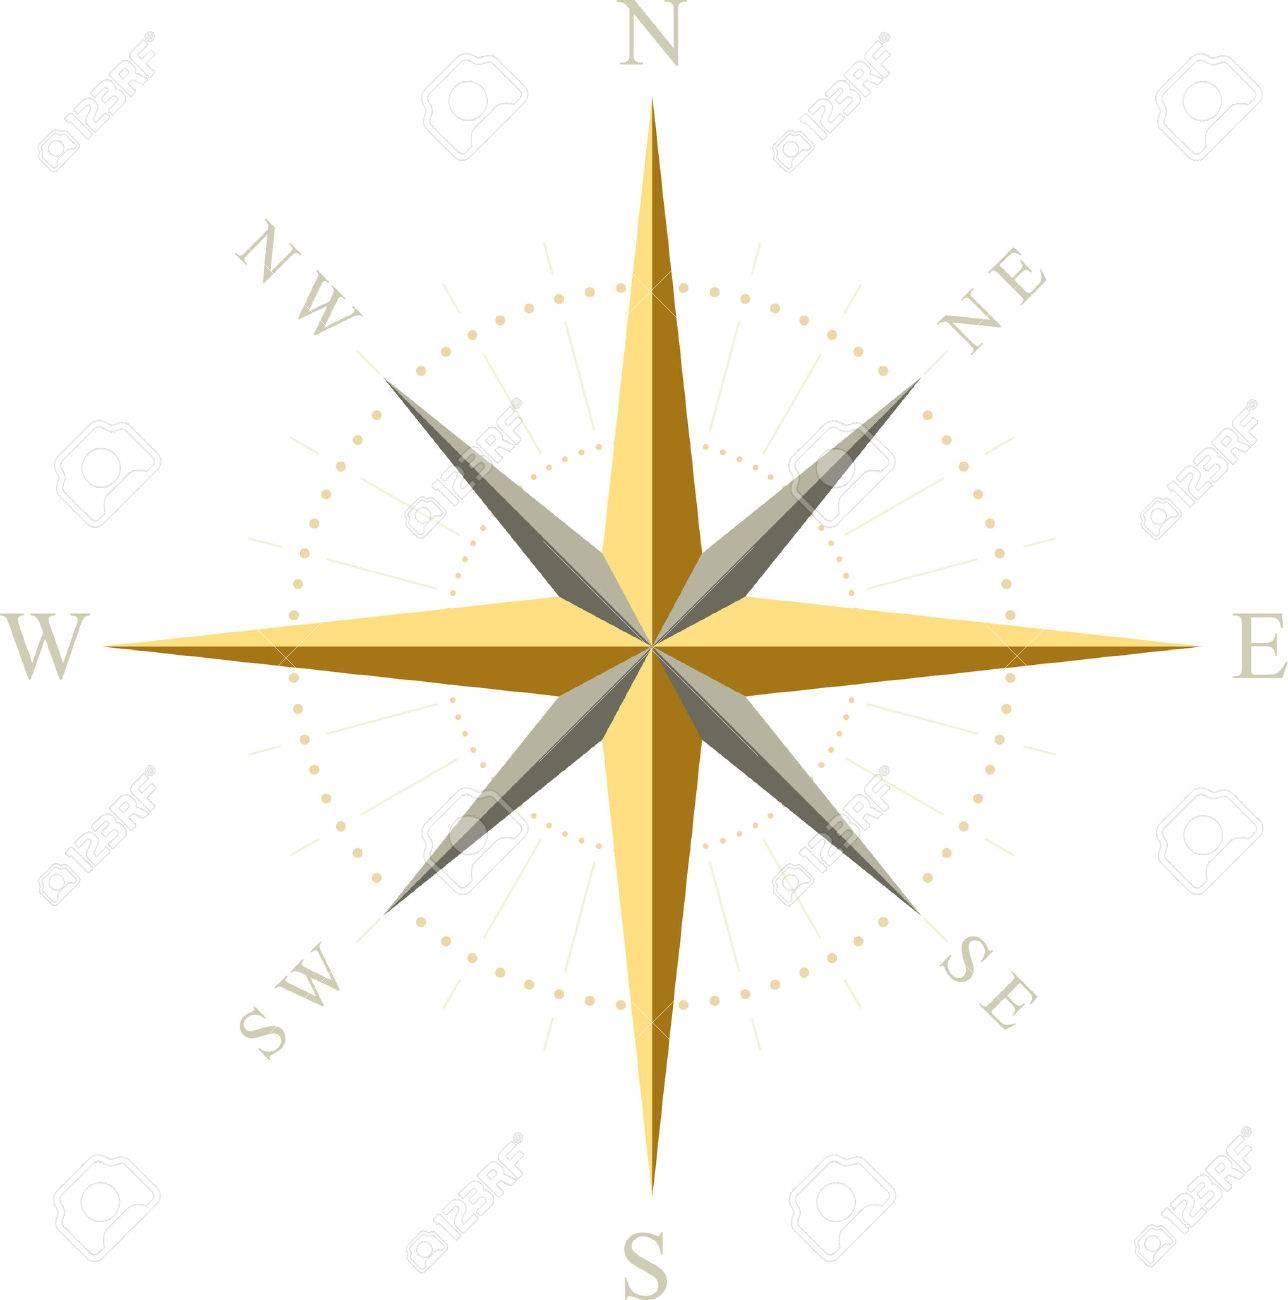 Compass. Vector illustration. Stock Vector - 5024002